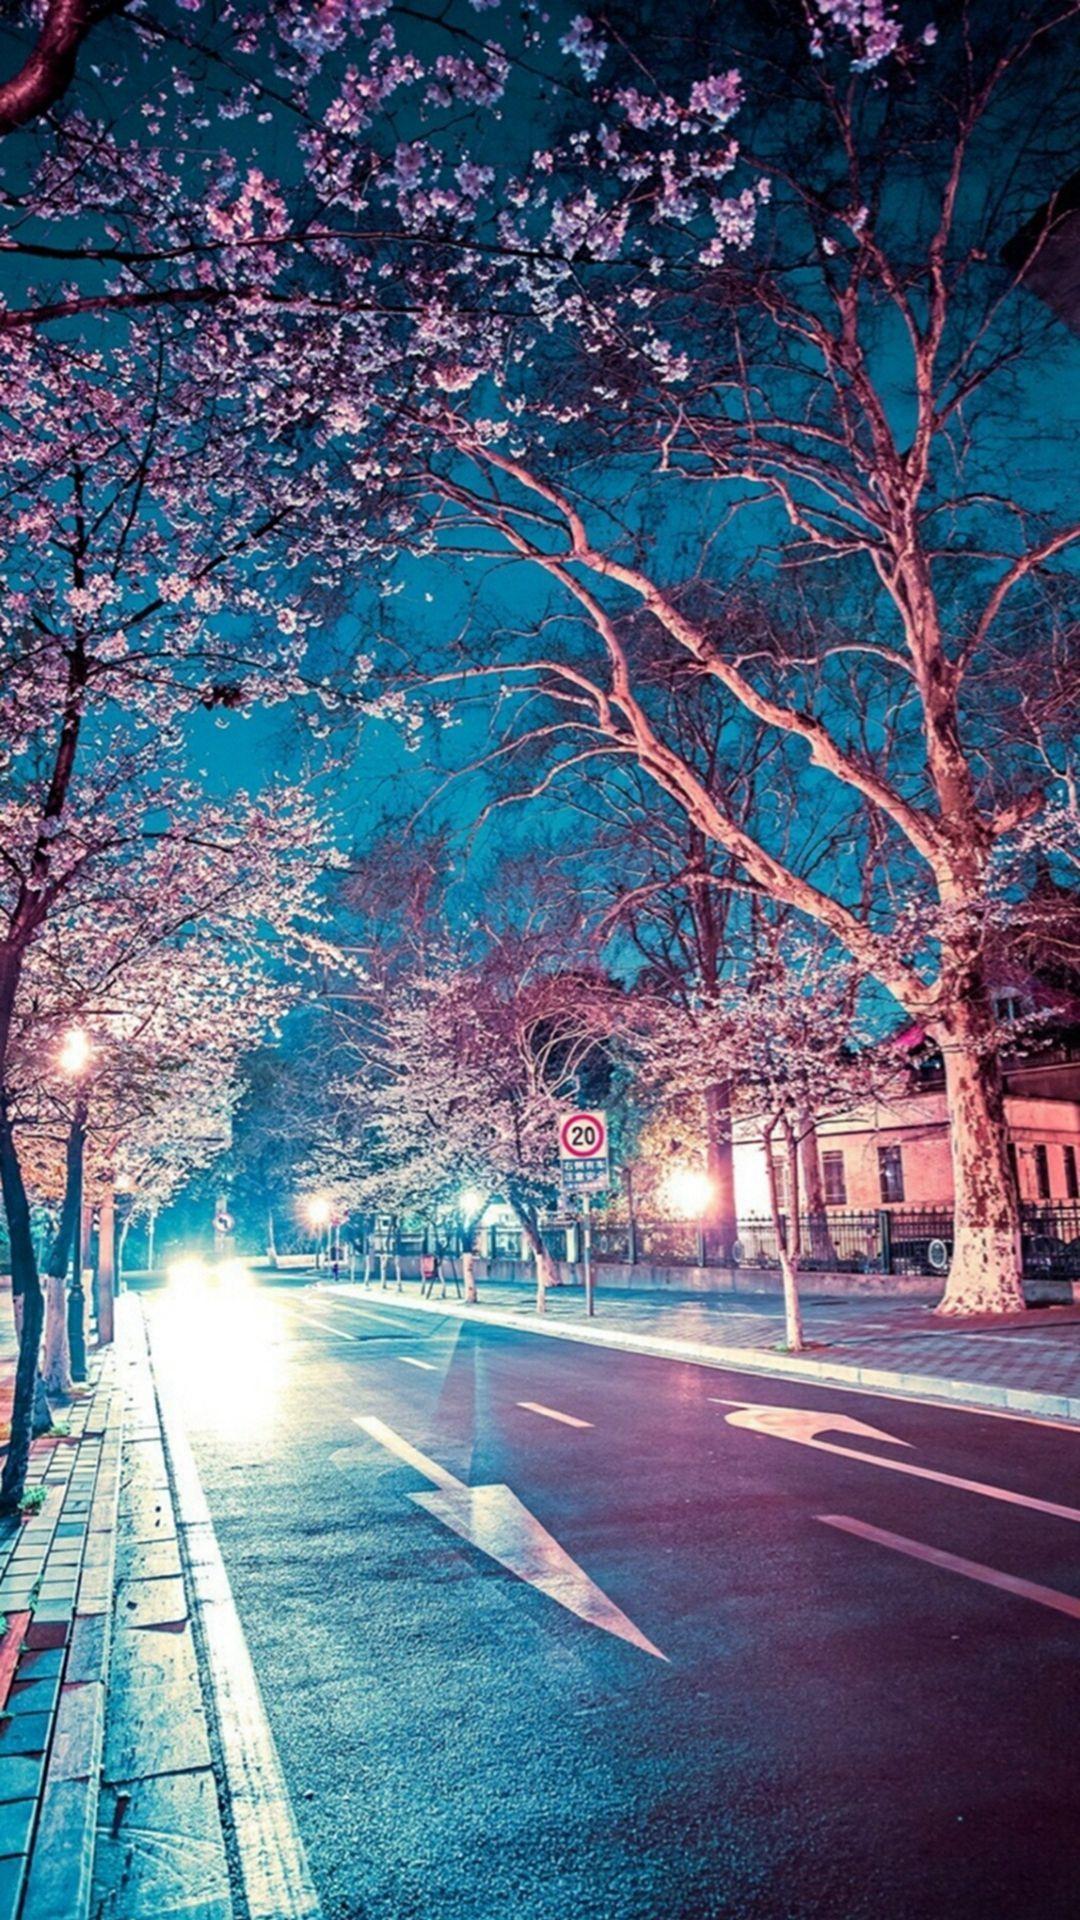 1080x1920 Japanese Street Cherry Blossom Night Scenery Iphone 6 Wallpaper Photo Paysage Magnifique Photos Paysage Fond D Ecran Monde